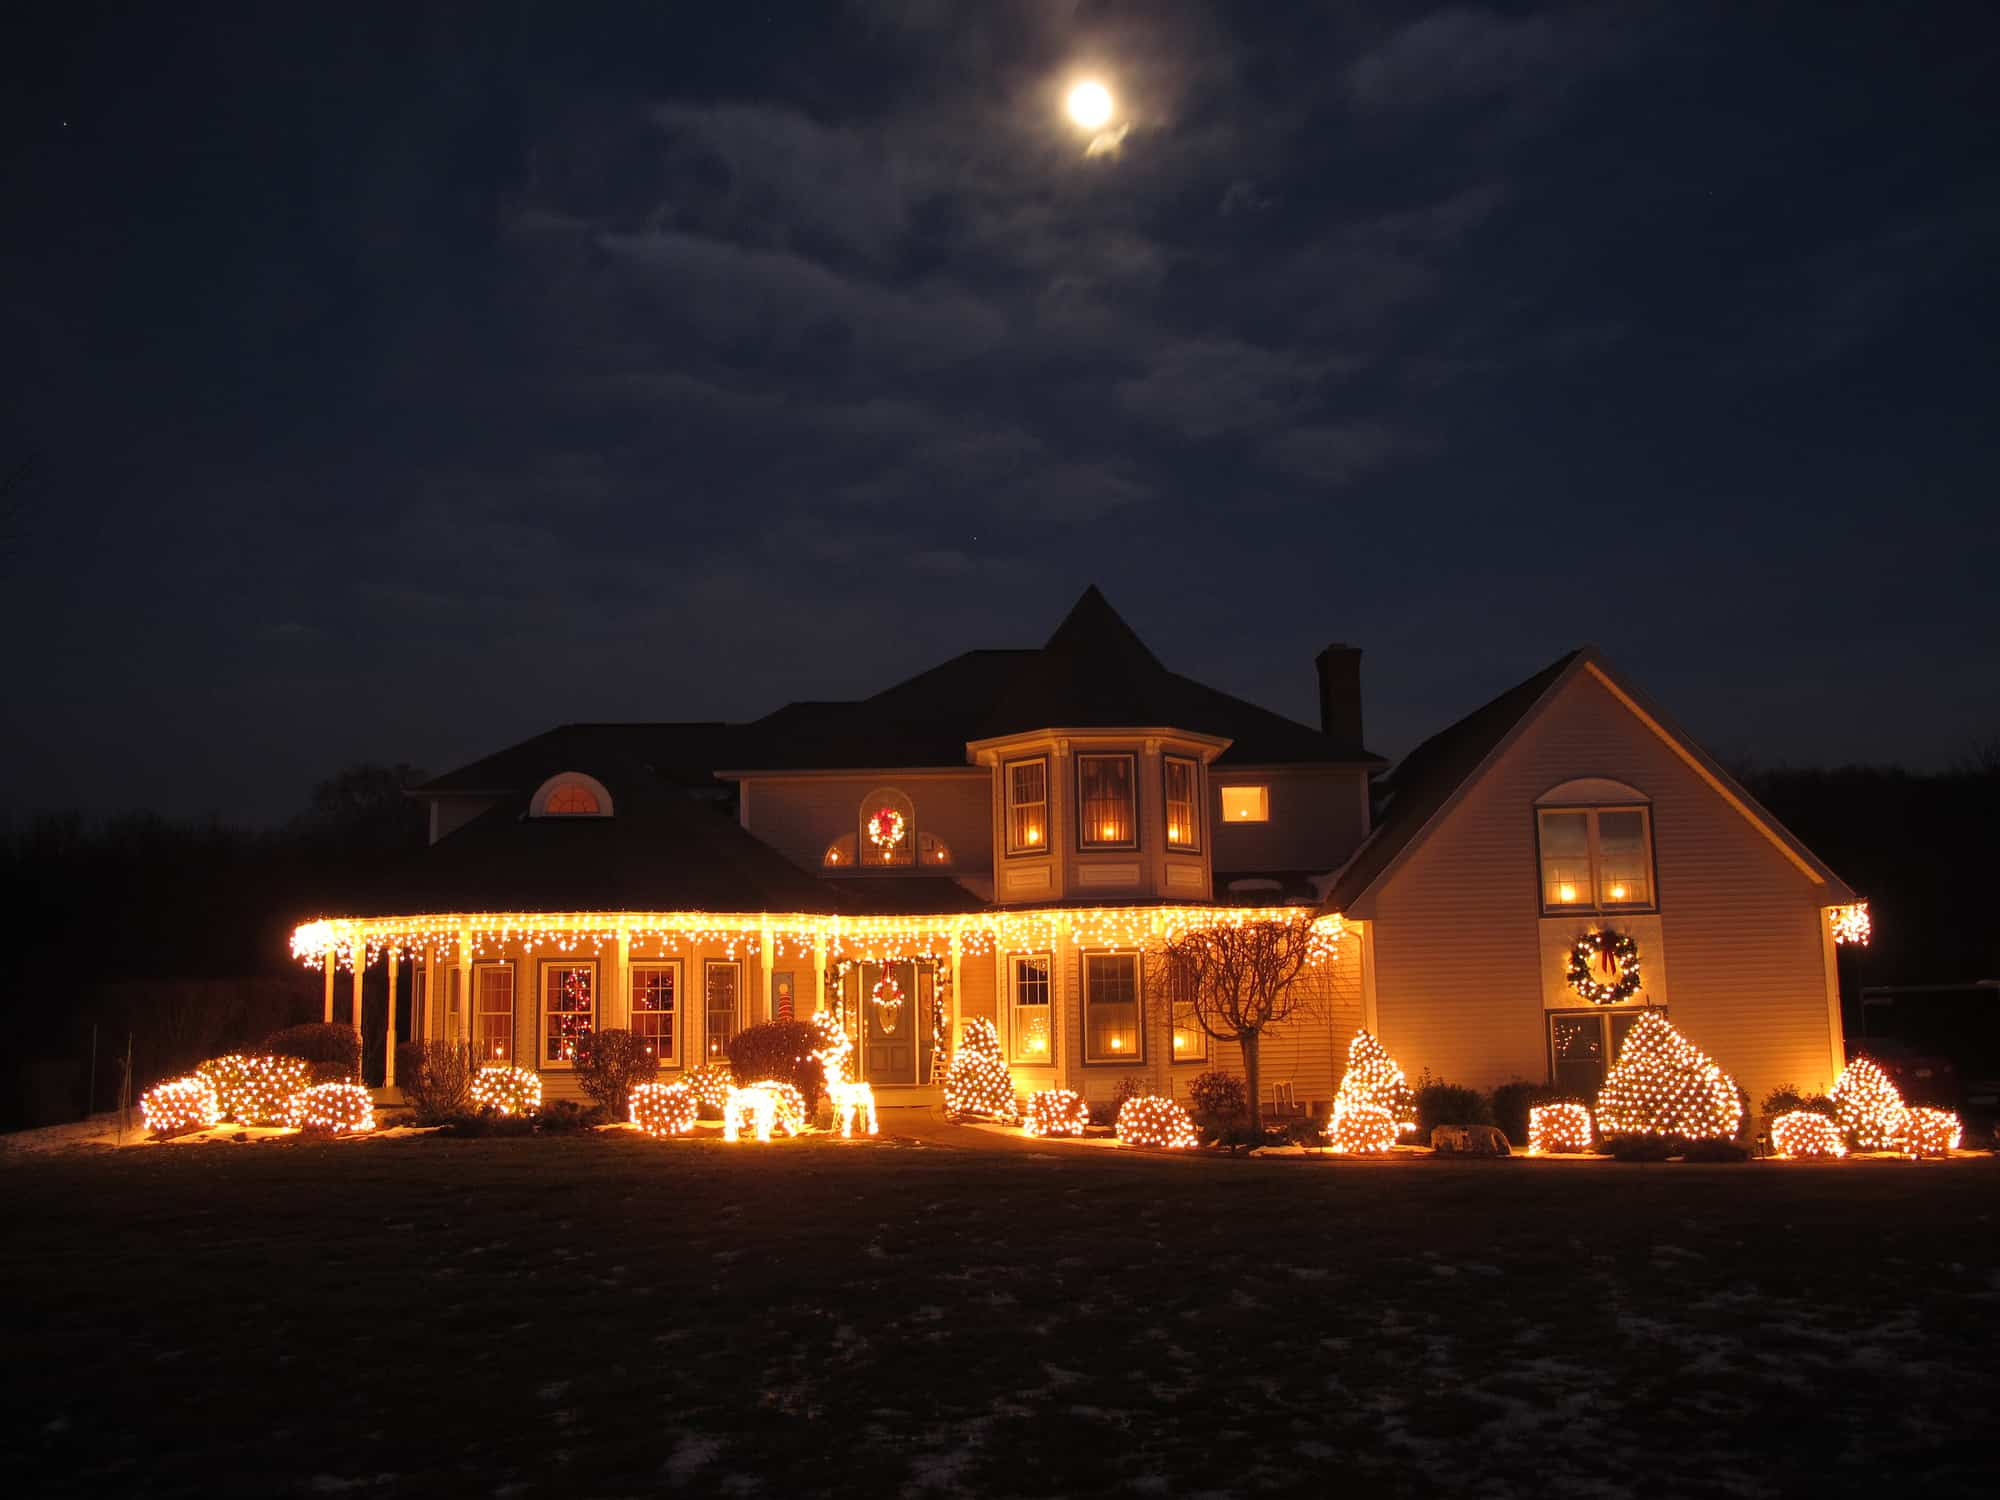 Indoor/Outdoor Ideas For Holiday Lighting In General